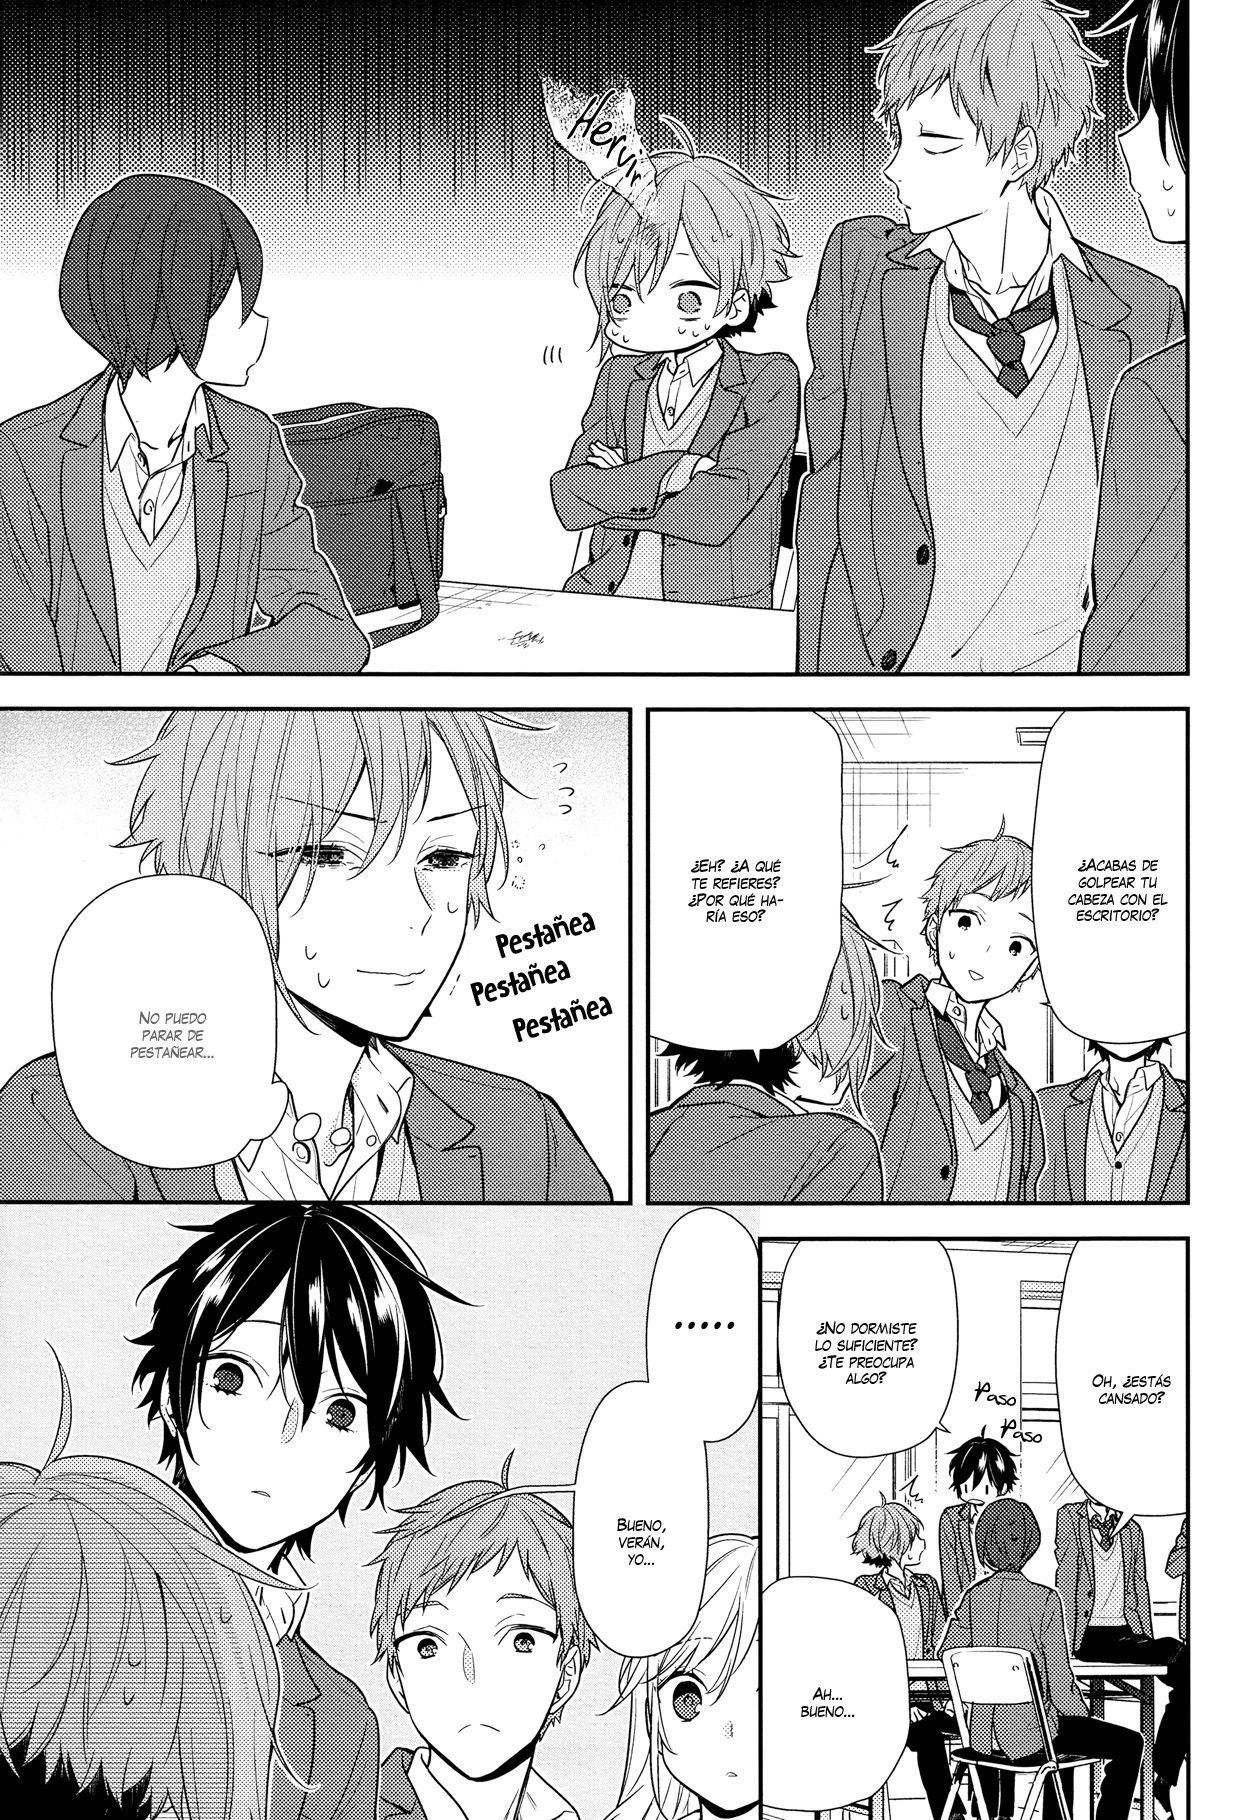 Horimiya 8300 por last heaven fansub manga lectores